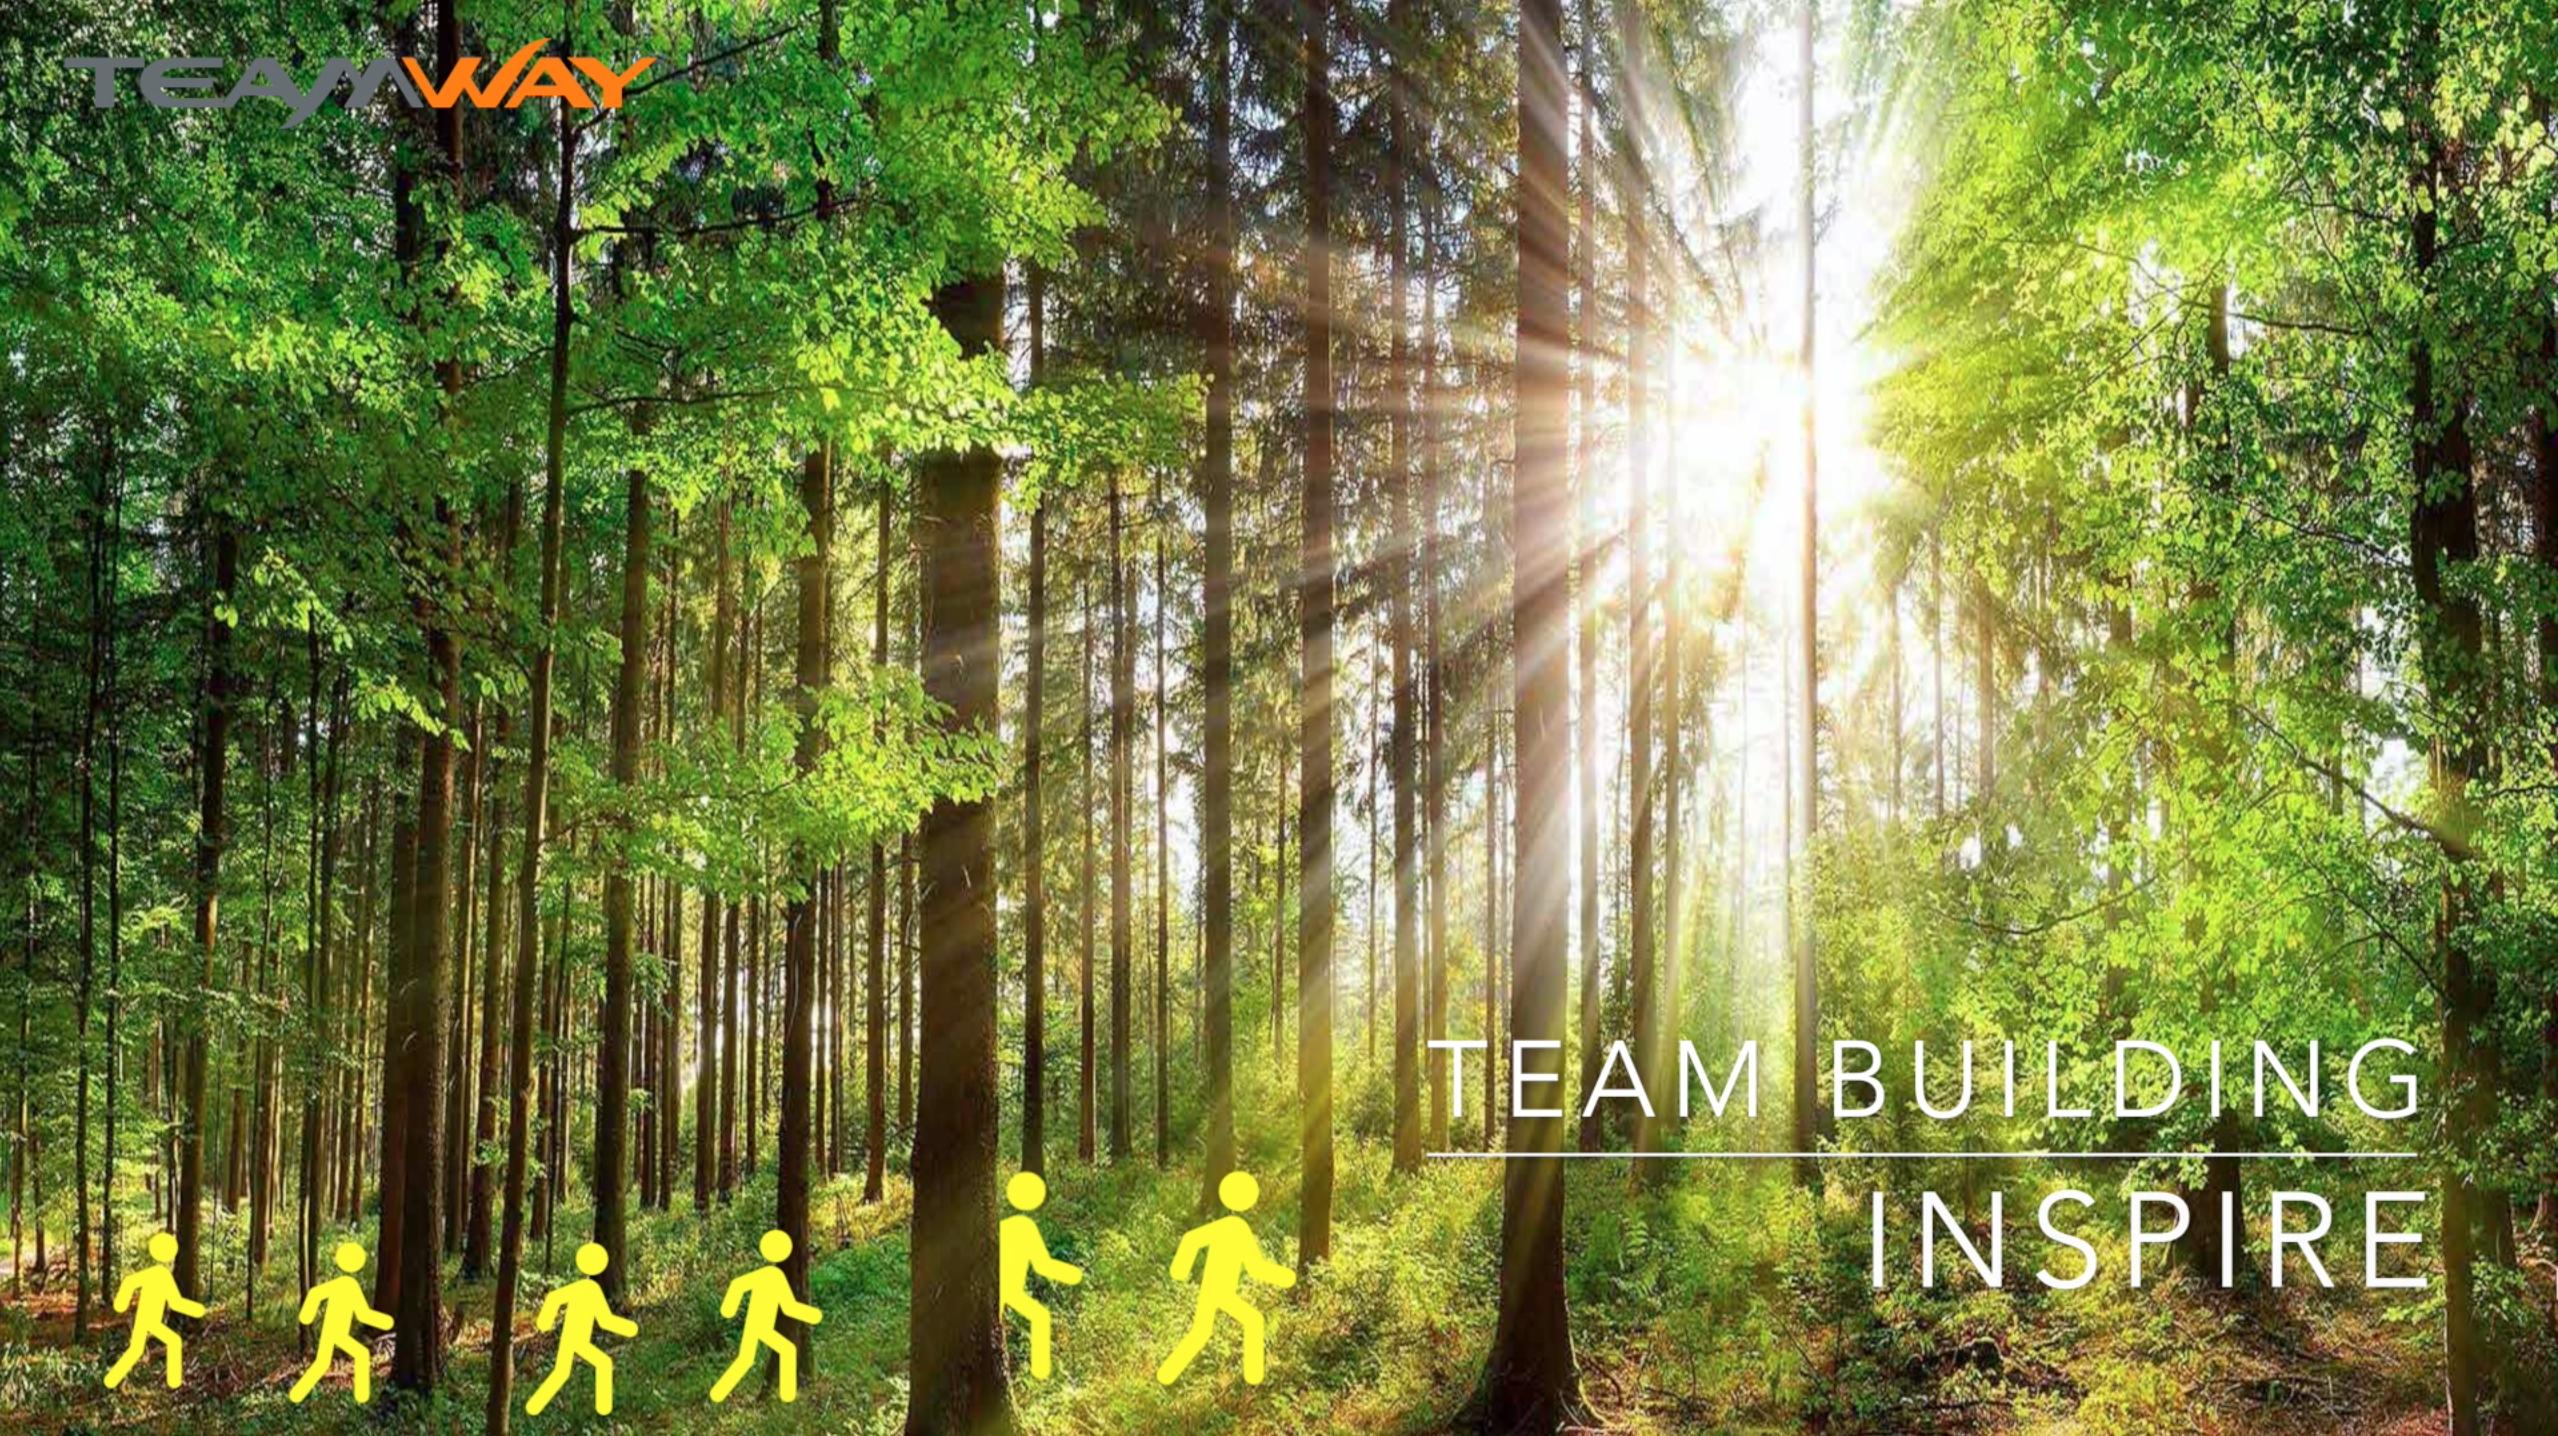 teambuilding - Teamway